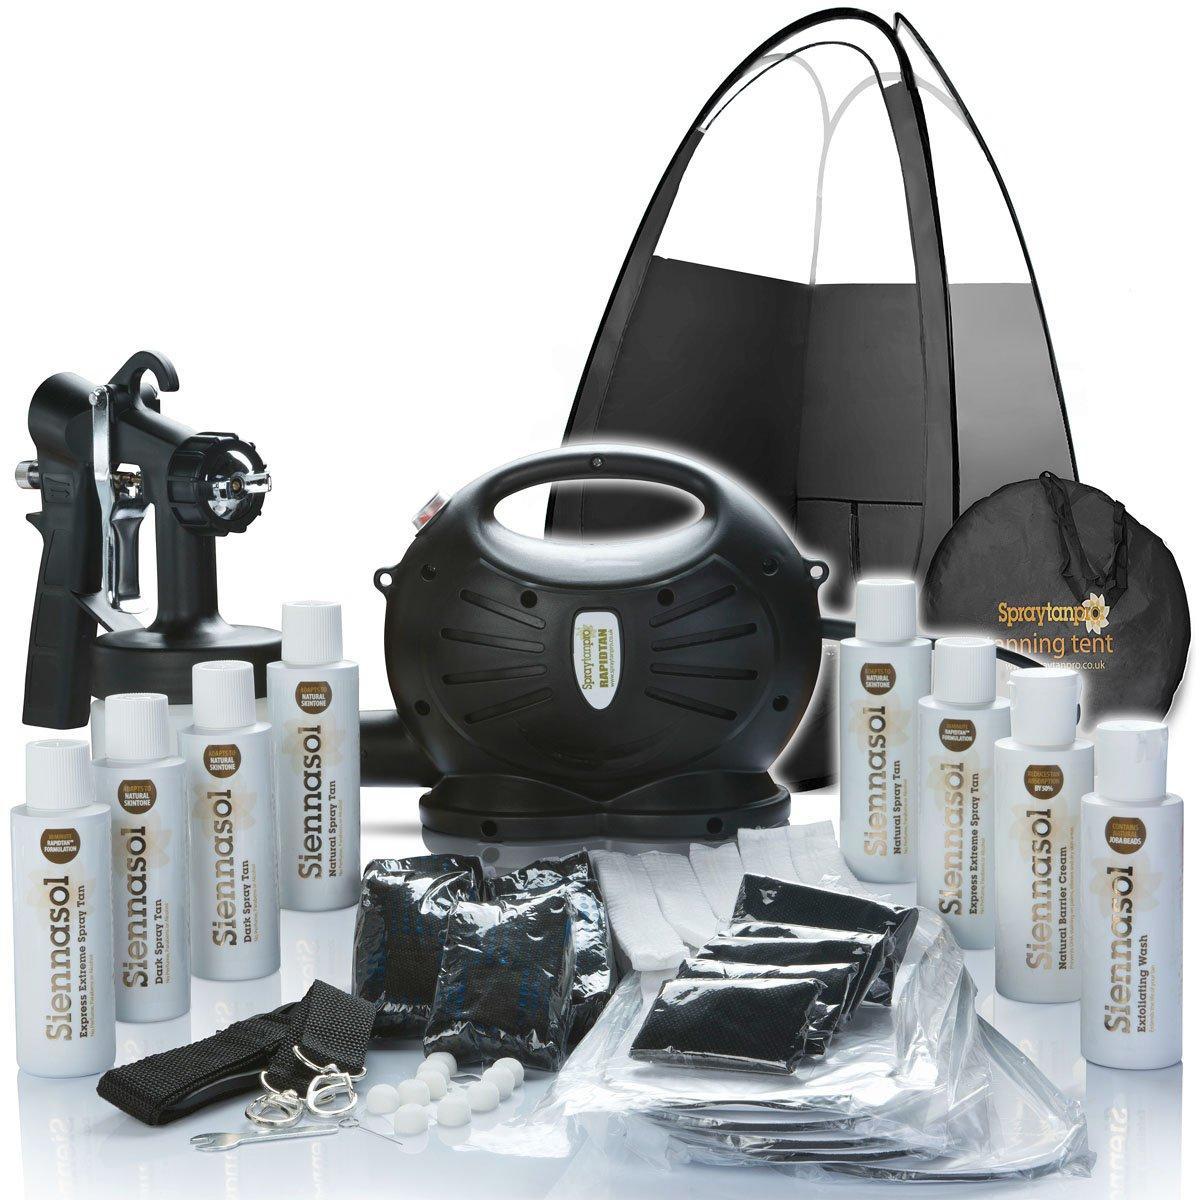 Spray Tan Machine | Rapidtan System Professional HVLP Spray Tan Kit with Supplies | Sticky feet, Tanning Tent, Airbrush Gun, 6 X Sunless Spray Tan Solutions